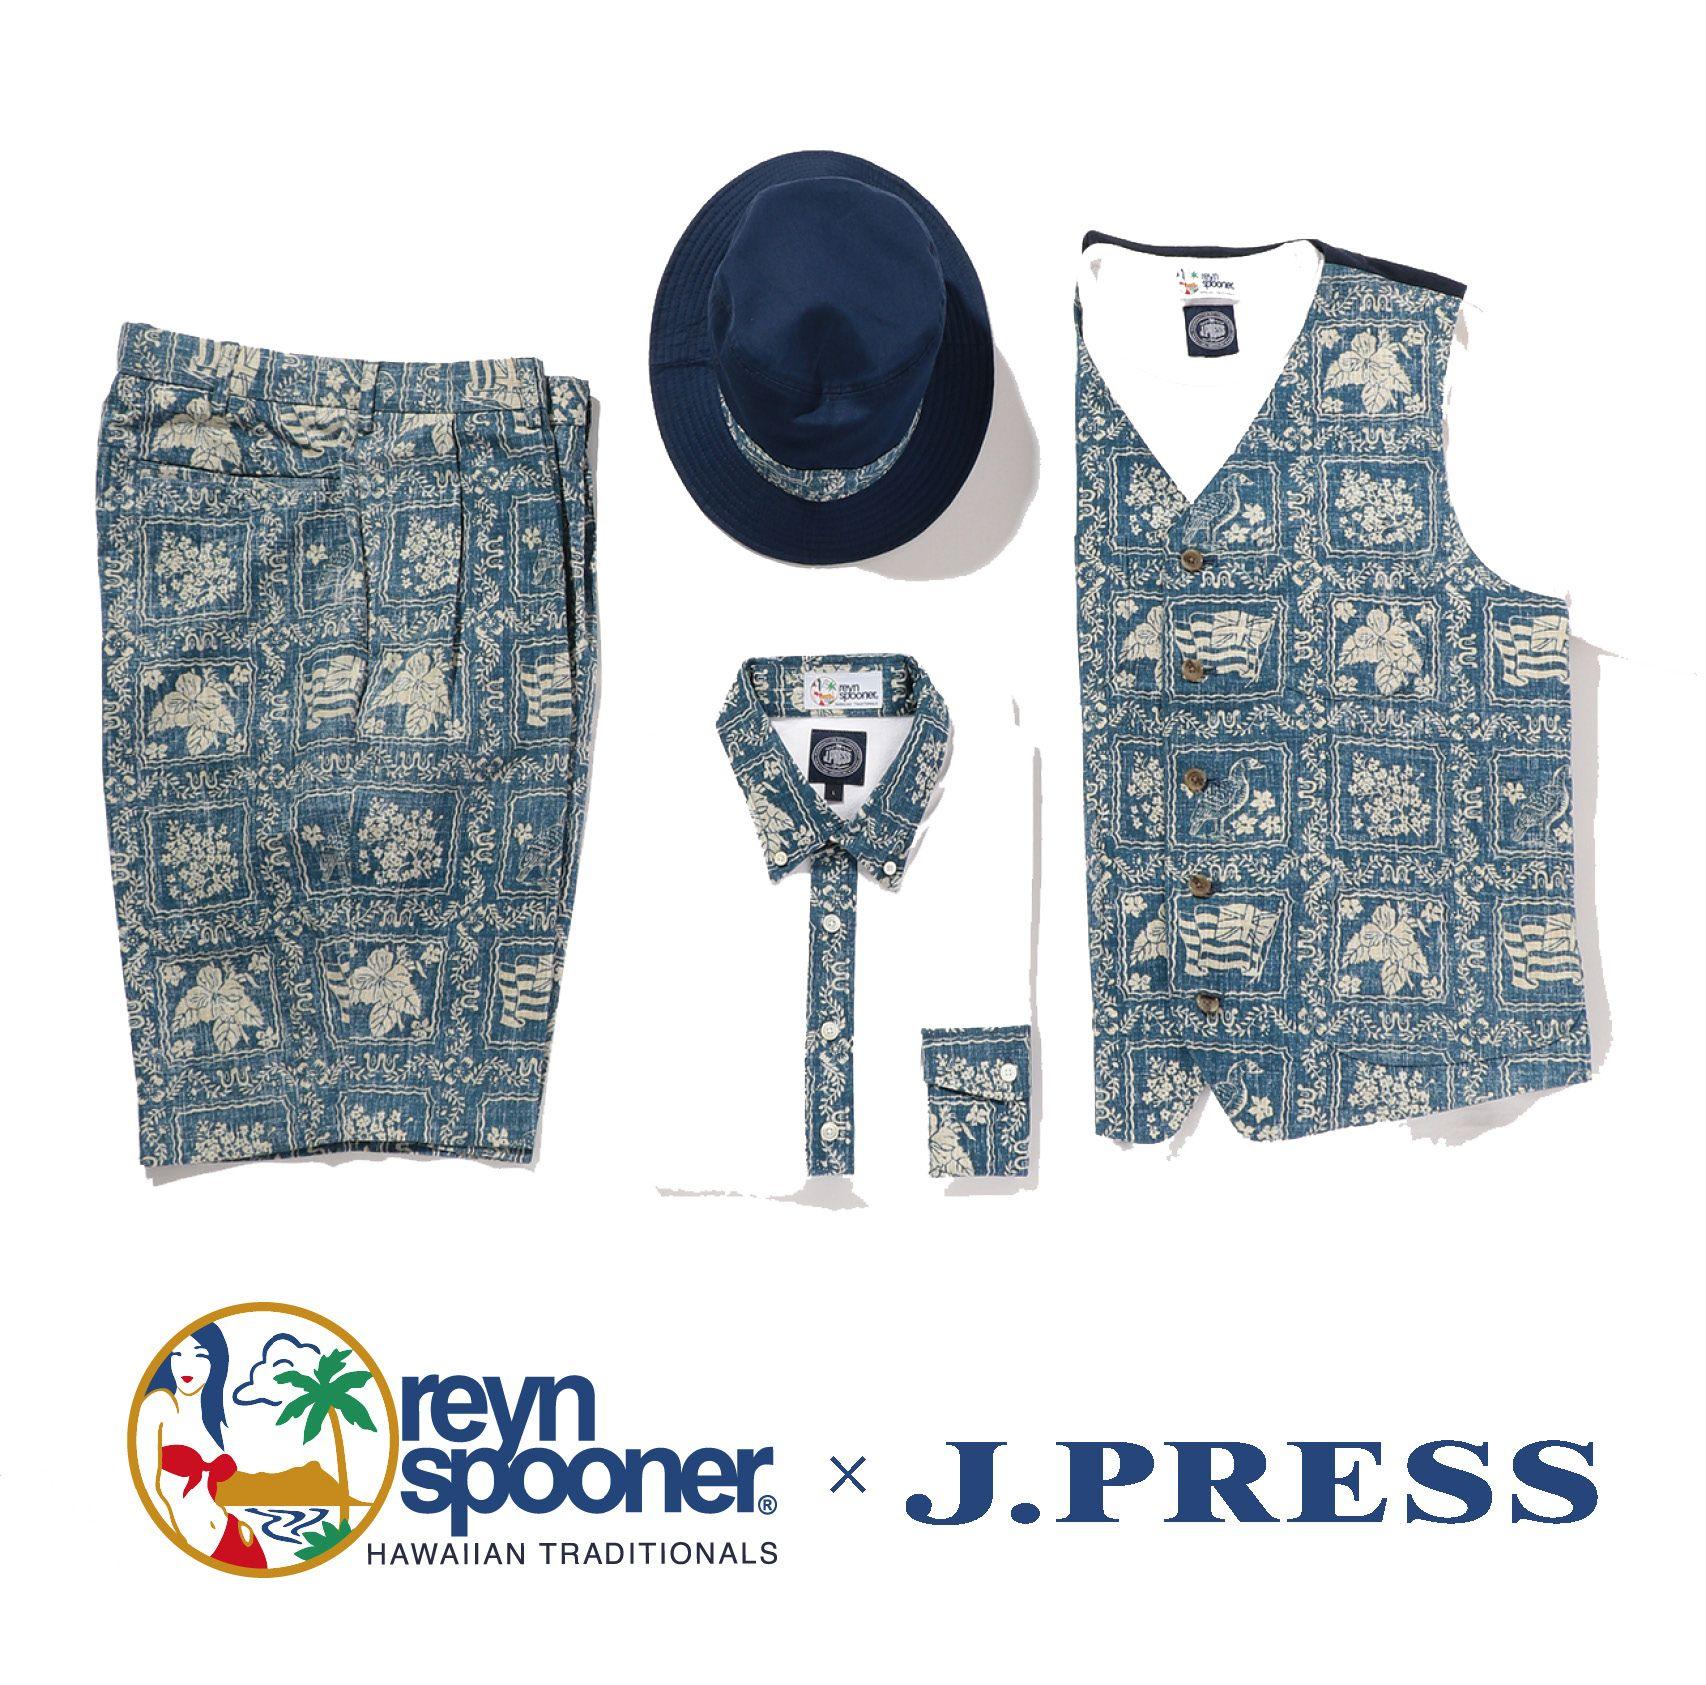 reynspoonere × J.PRESS